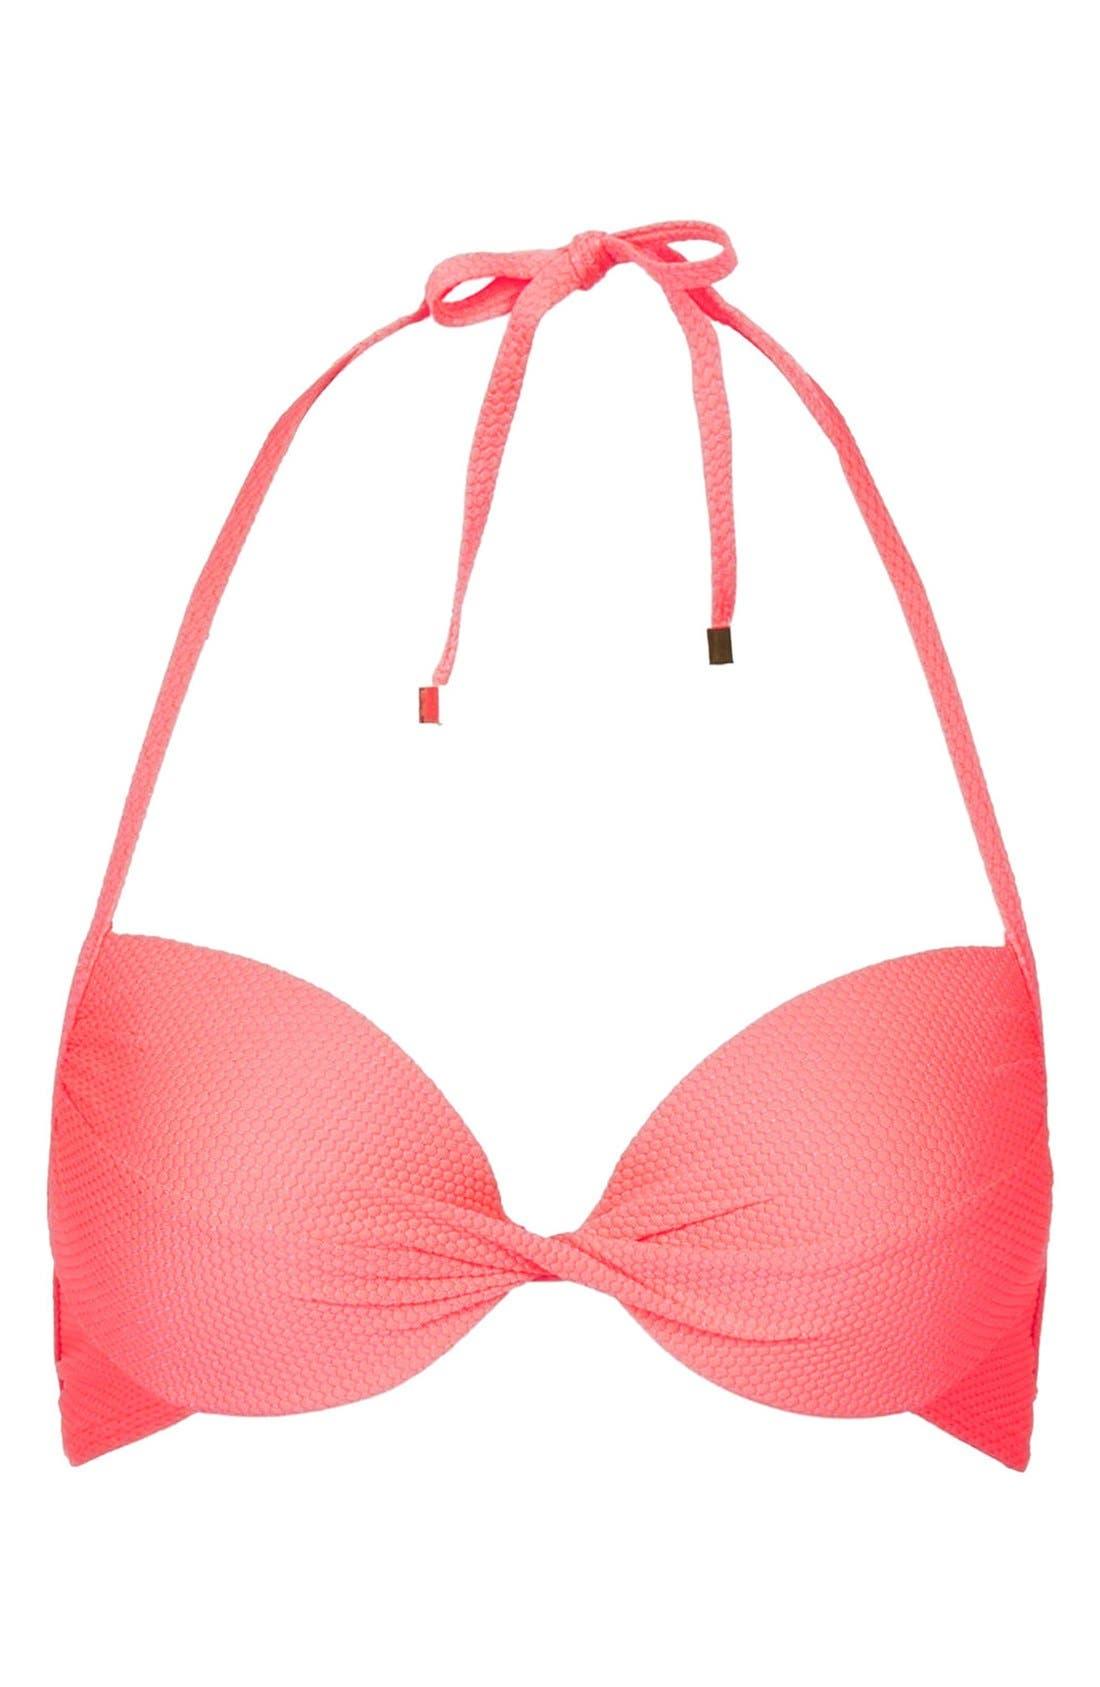 Alternate Image 1 Selected - Topshop Textured Plunge Bikini Top